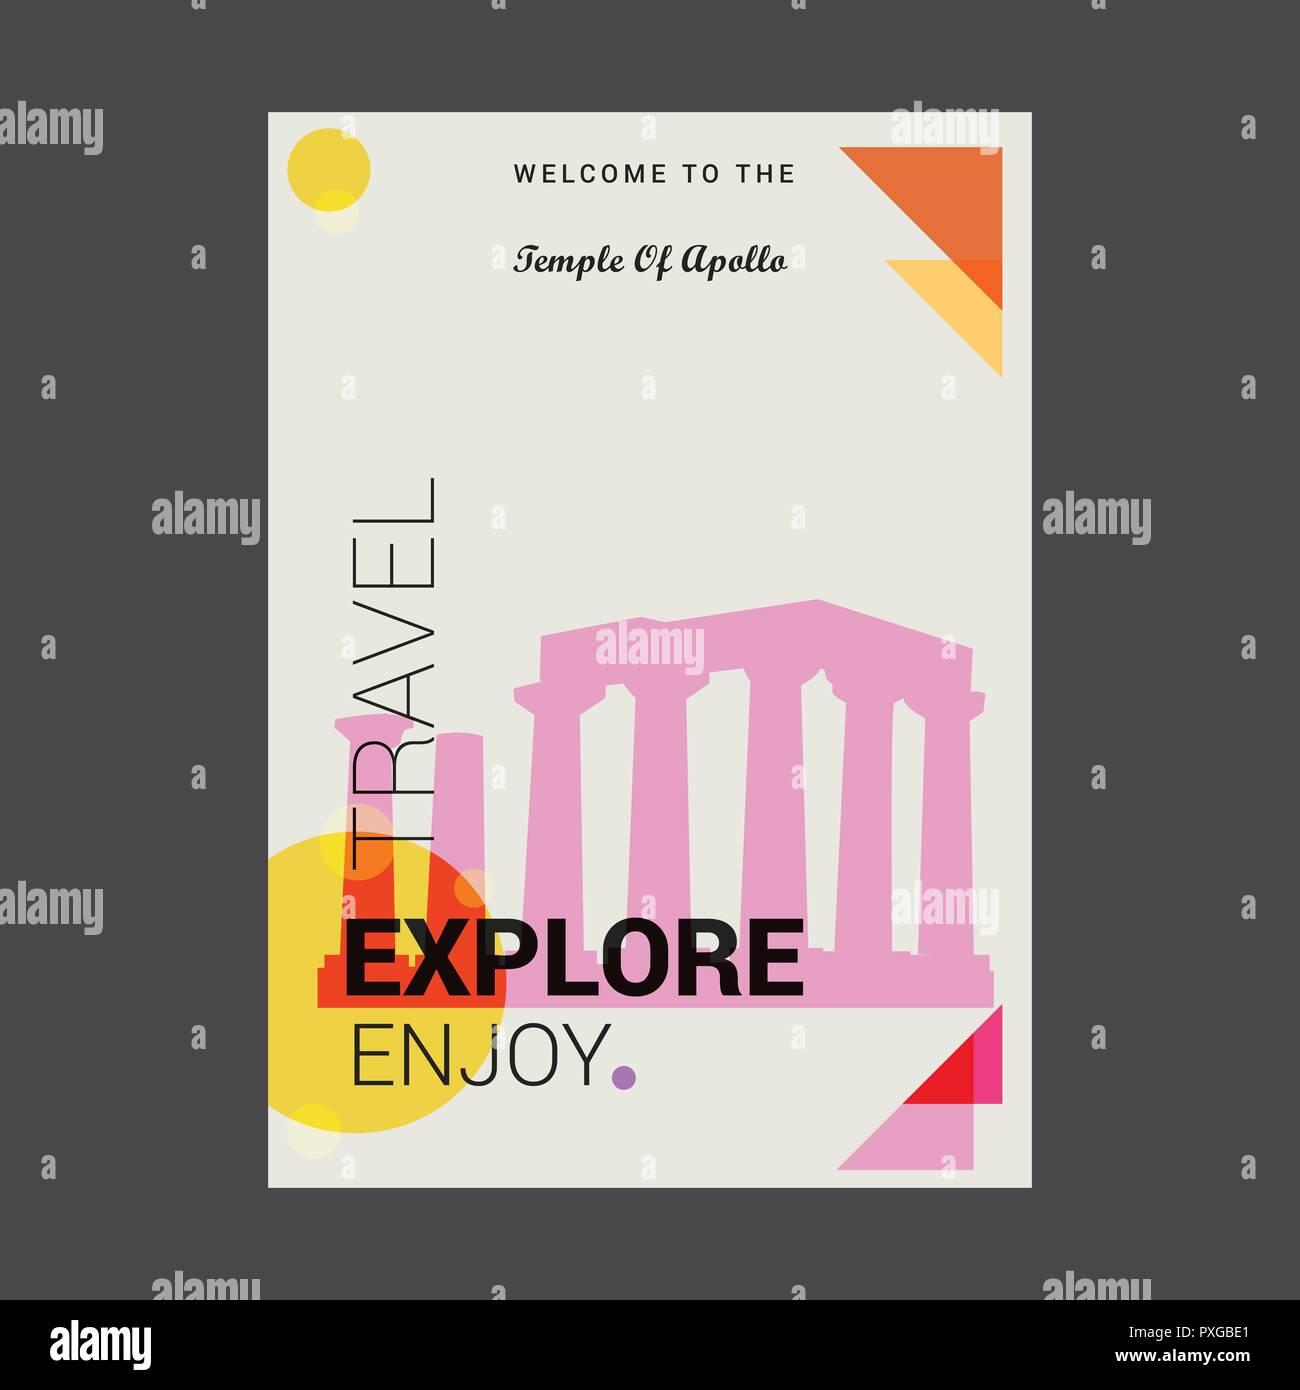 Welcome to The Temple of Apollo Attica, Greece. Explore, Travel Enjoy Poster Template - Stock Vector